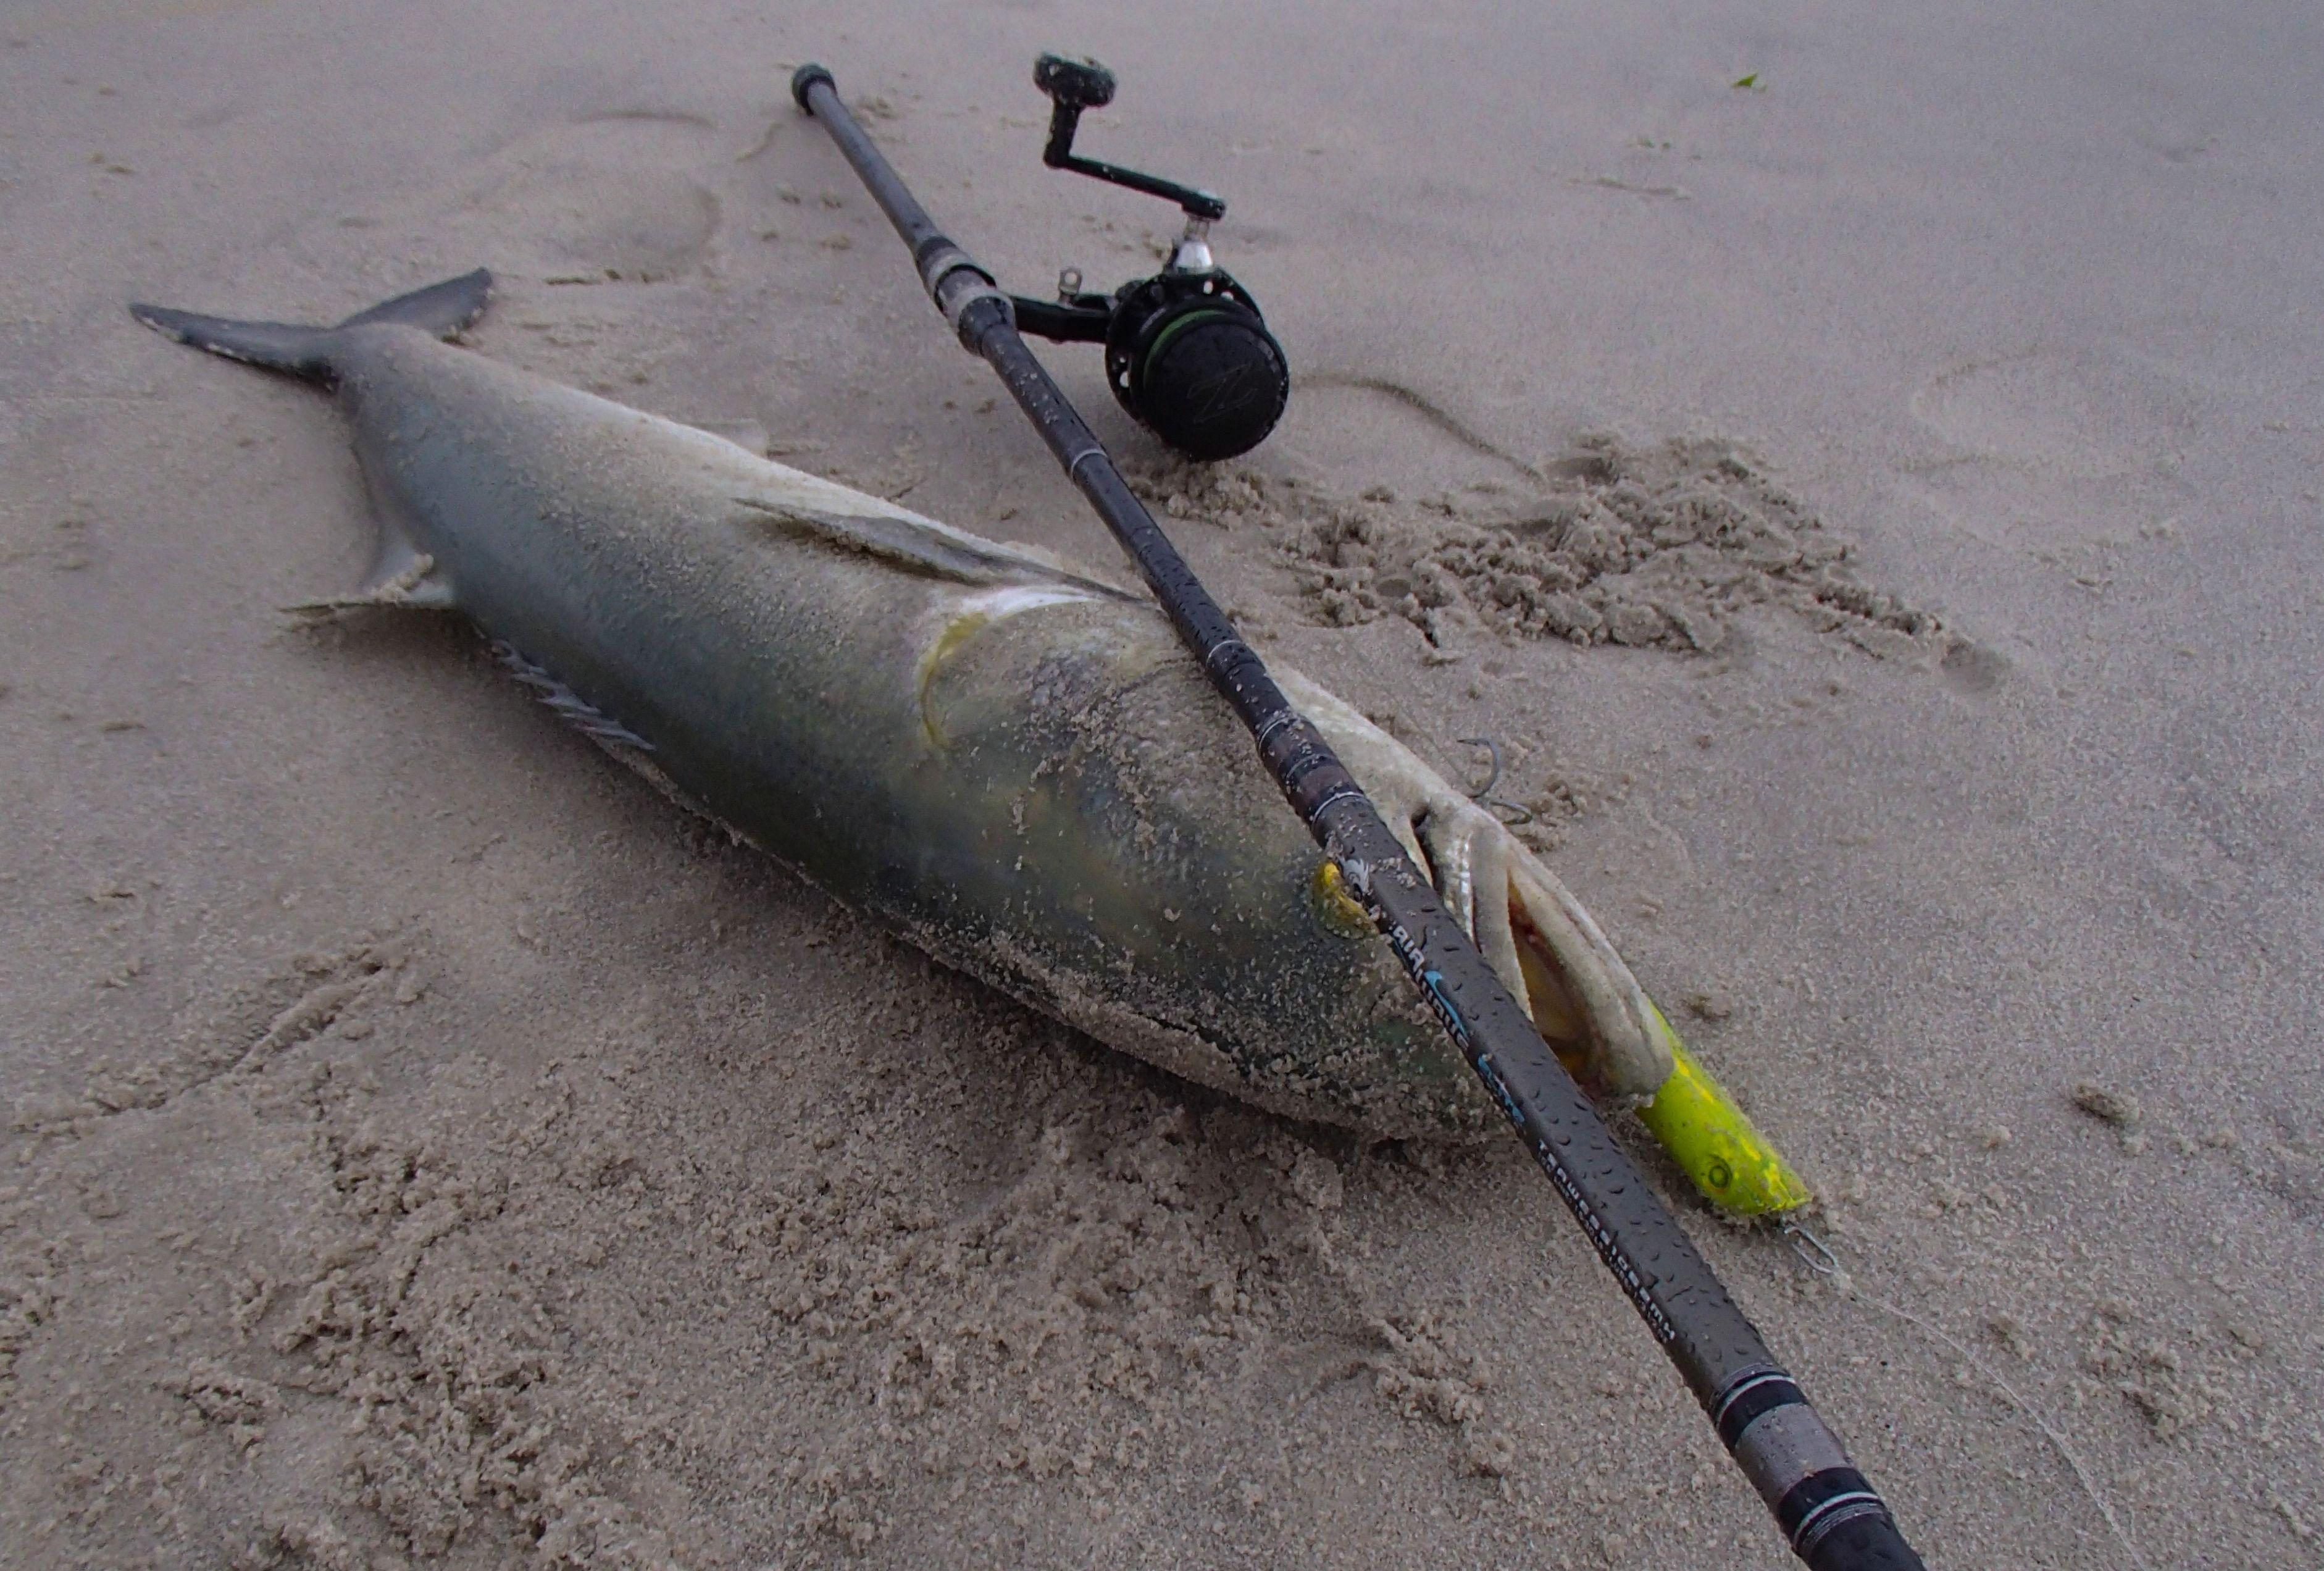 Bluefish On A Tsunami Airwave Elite Spin Fishing Rod 2 Pc 10 6 15 30 Lb Tsawess 1062mh Fish Bluefish Fishing Rod